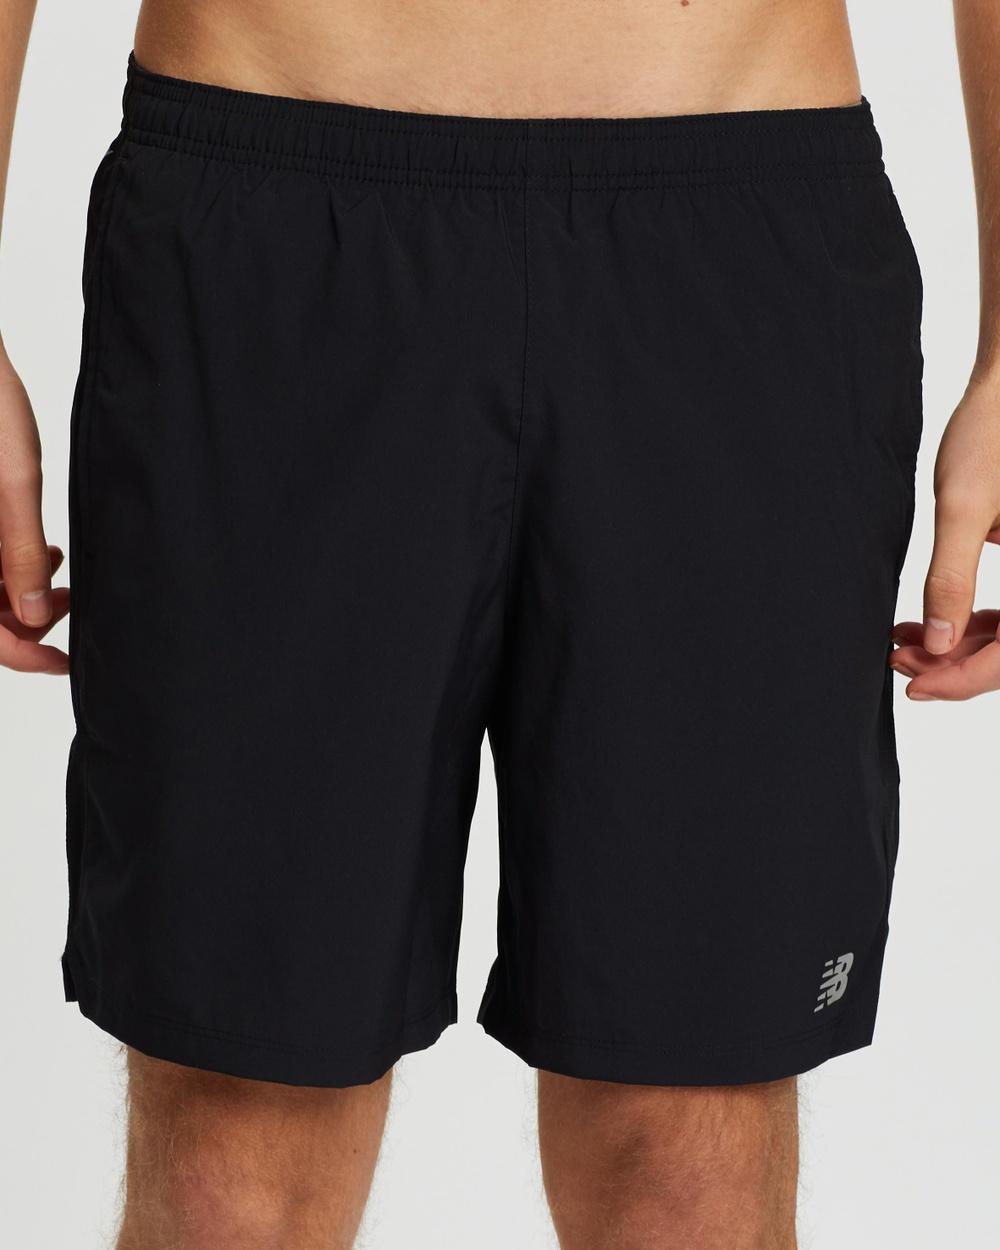 "New Balance Accelerate 7"" Shorts Black"